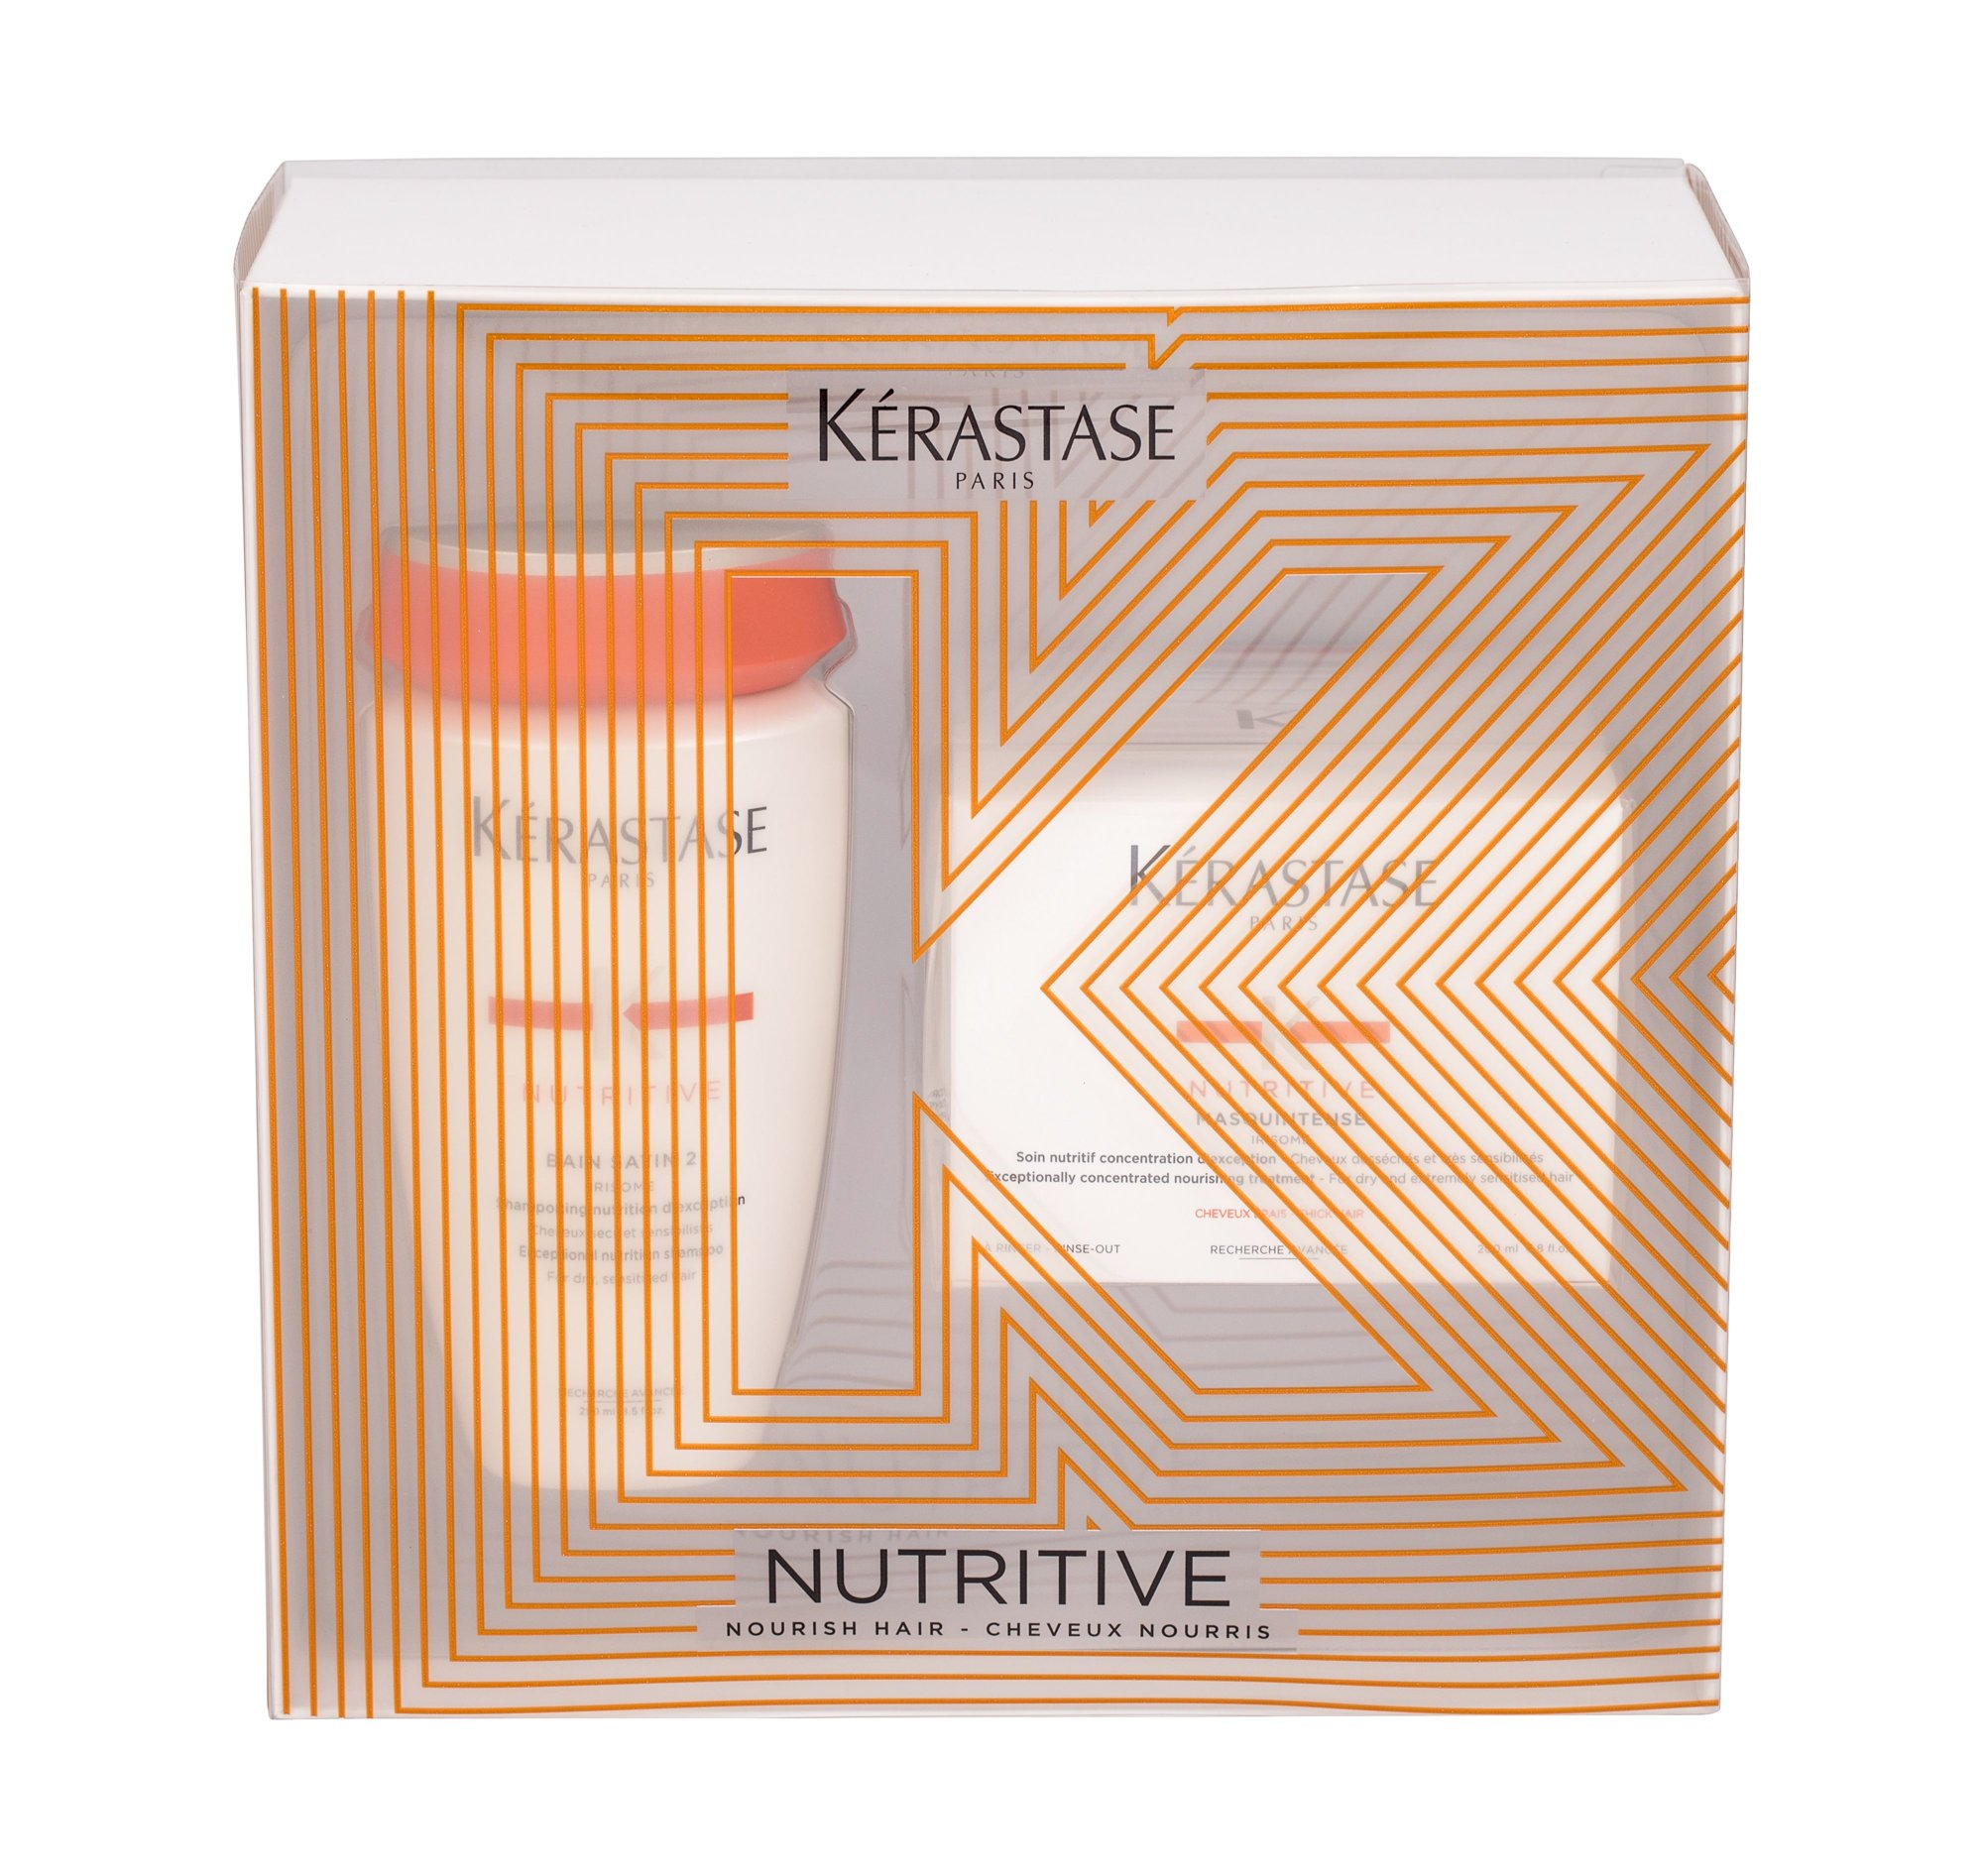 Kérastase Nutritive Shampoo 250ml